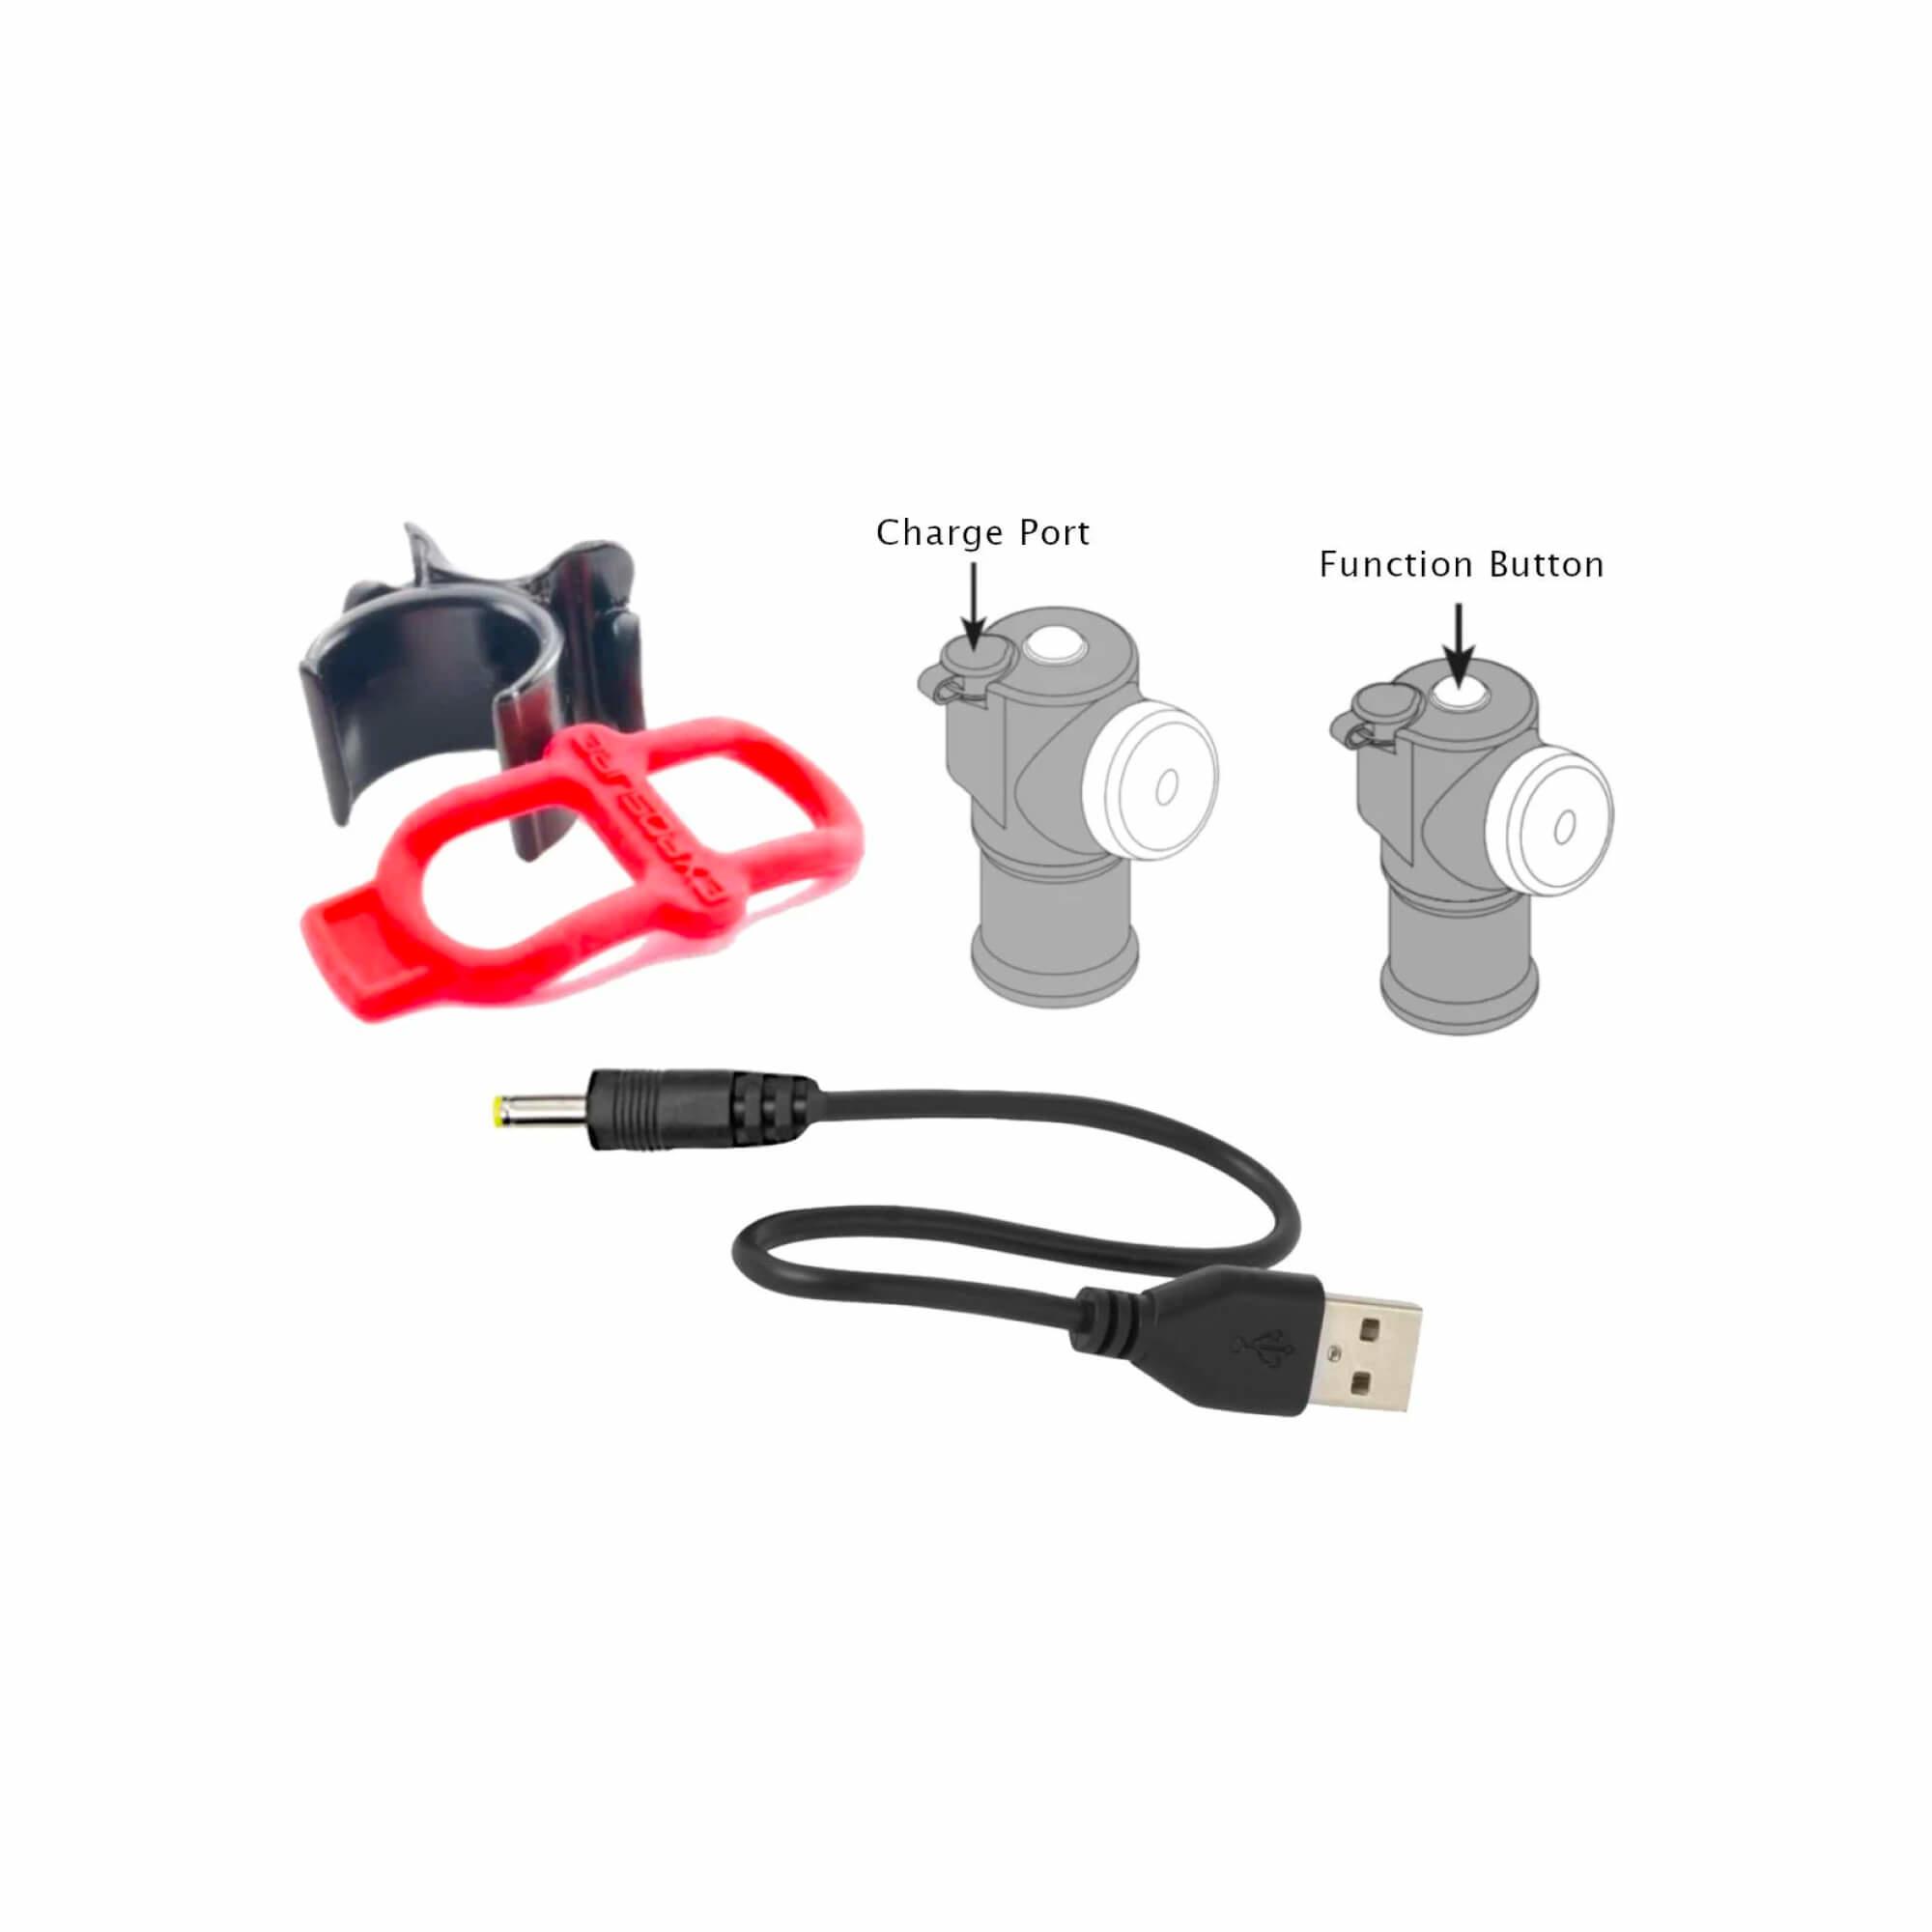 Blaze MK3 150-80 Lumen With Daybright, Reakt & Peleton Mode-2